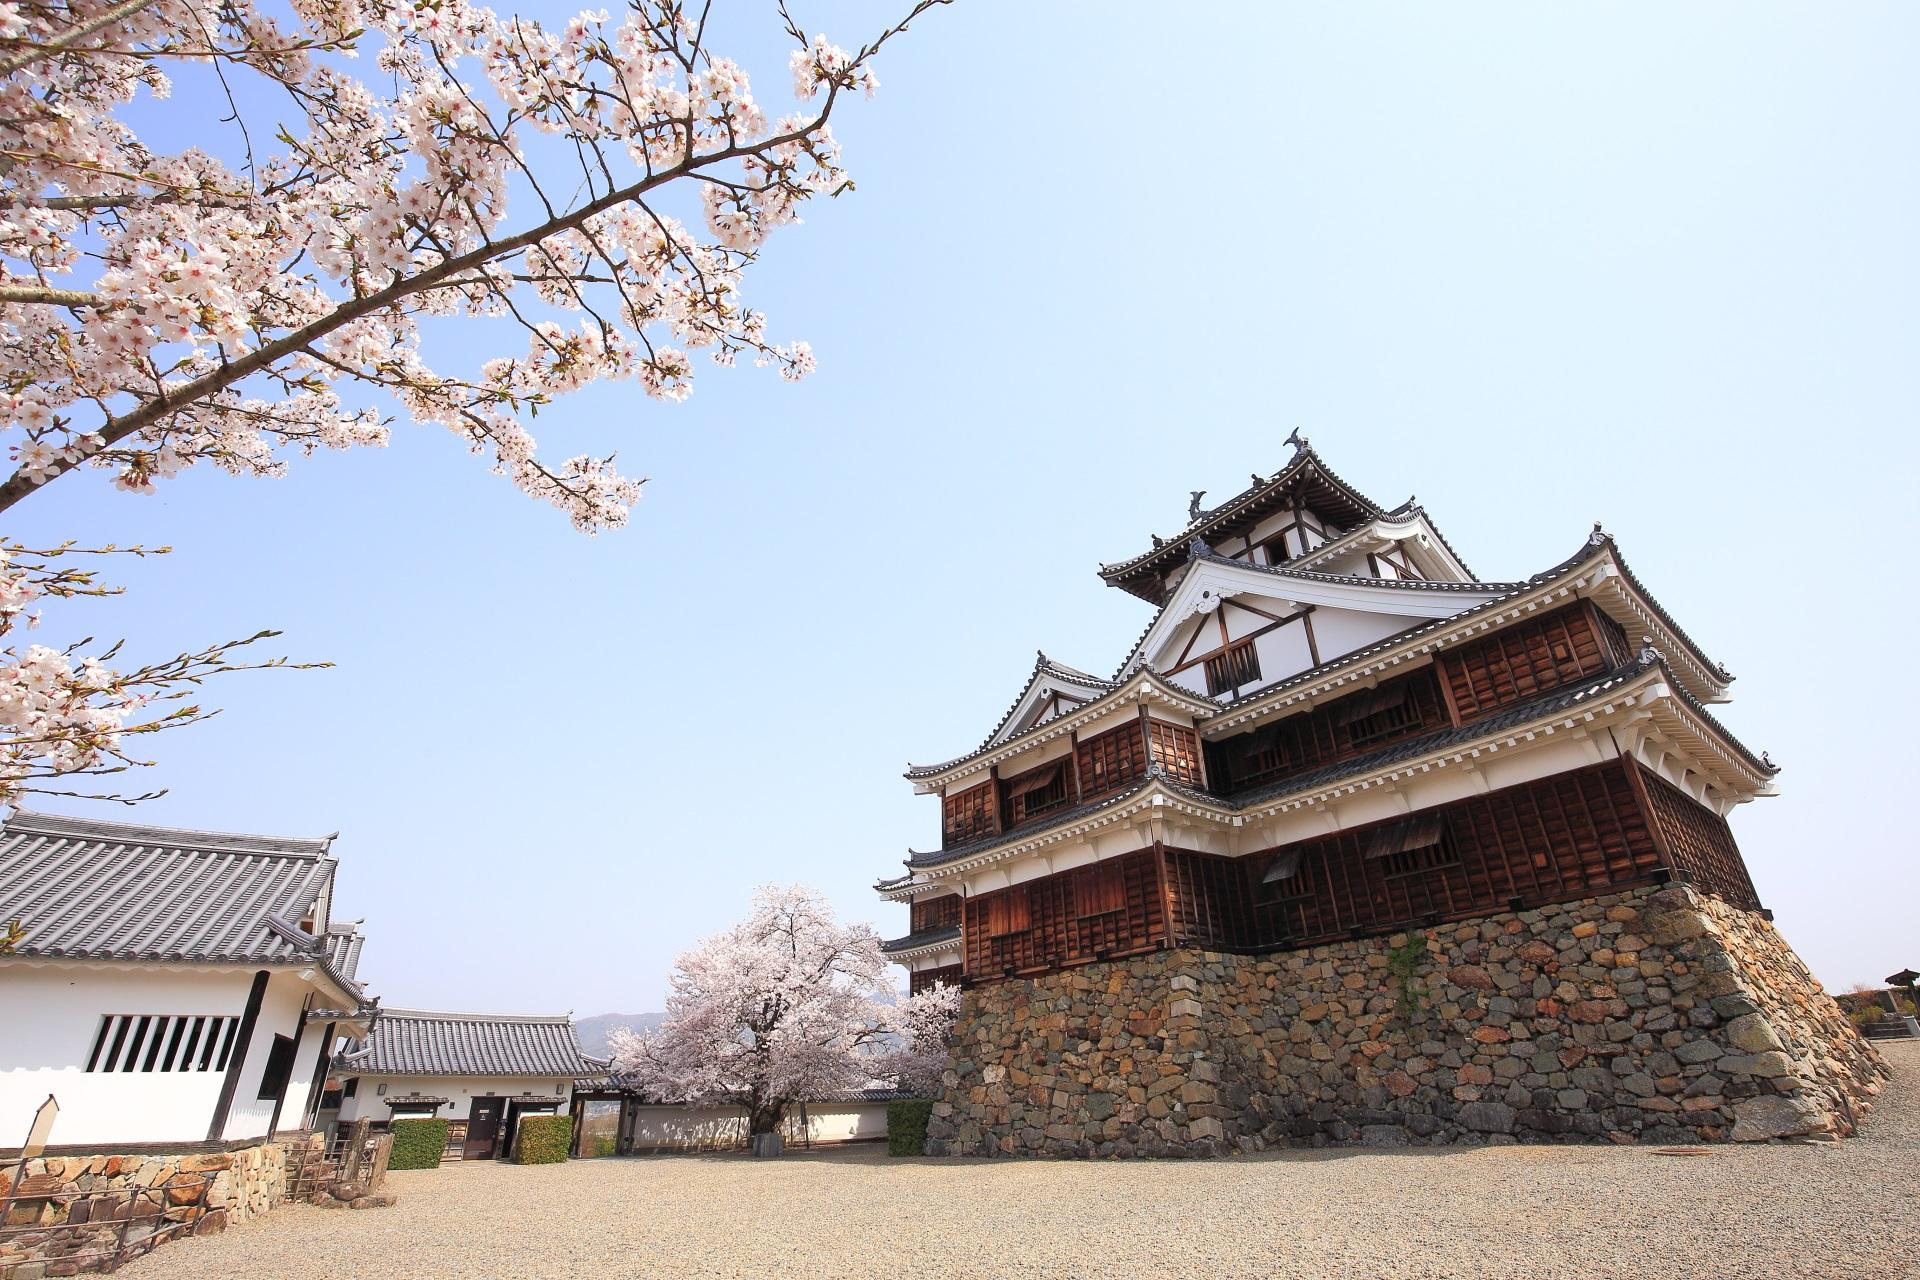 福知山城の素晴らしい城郭や春の桜